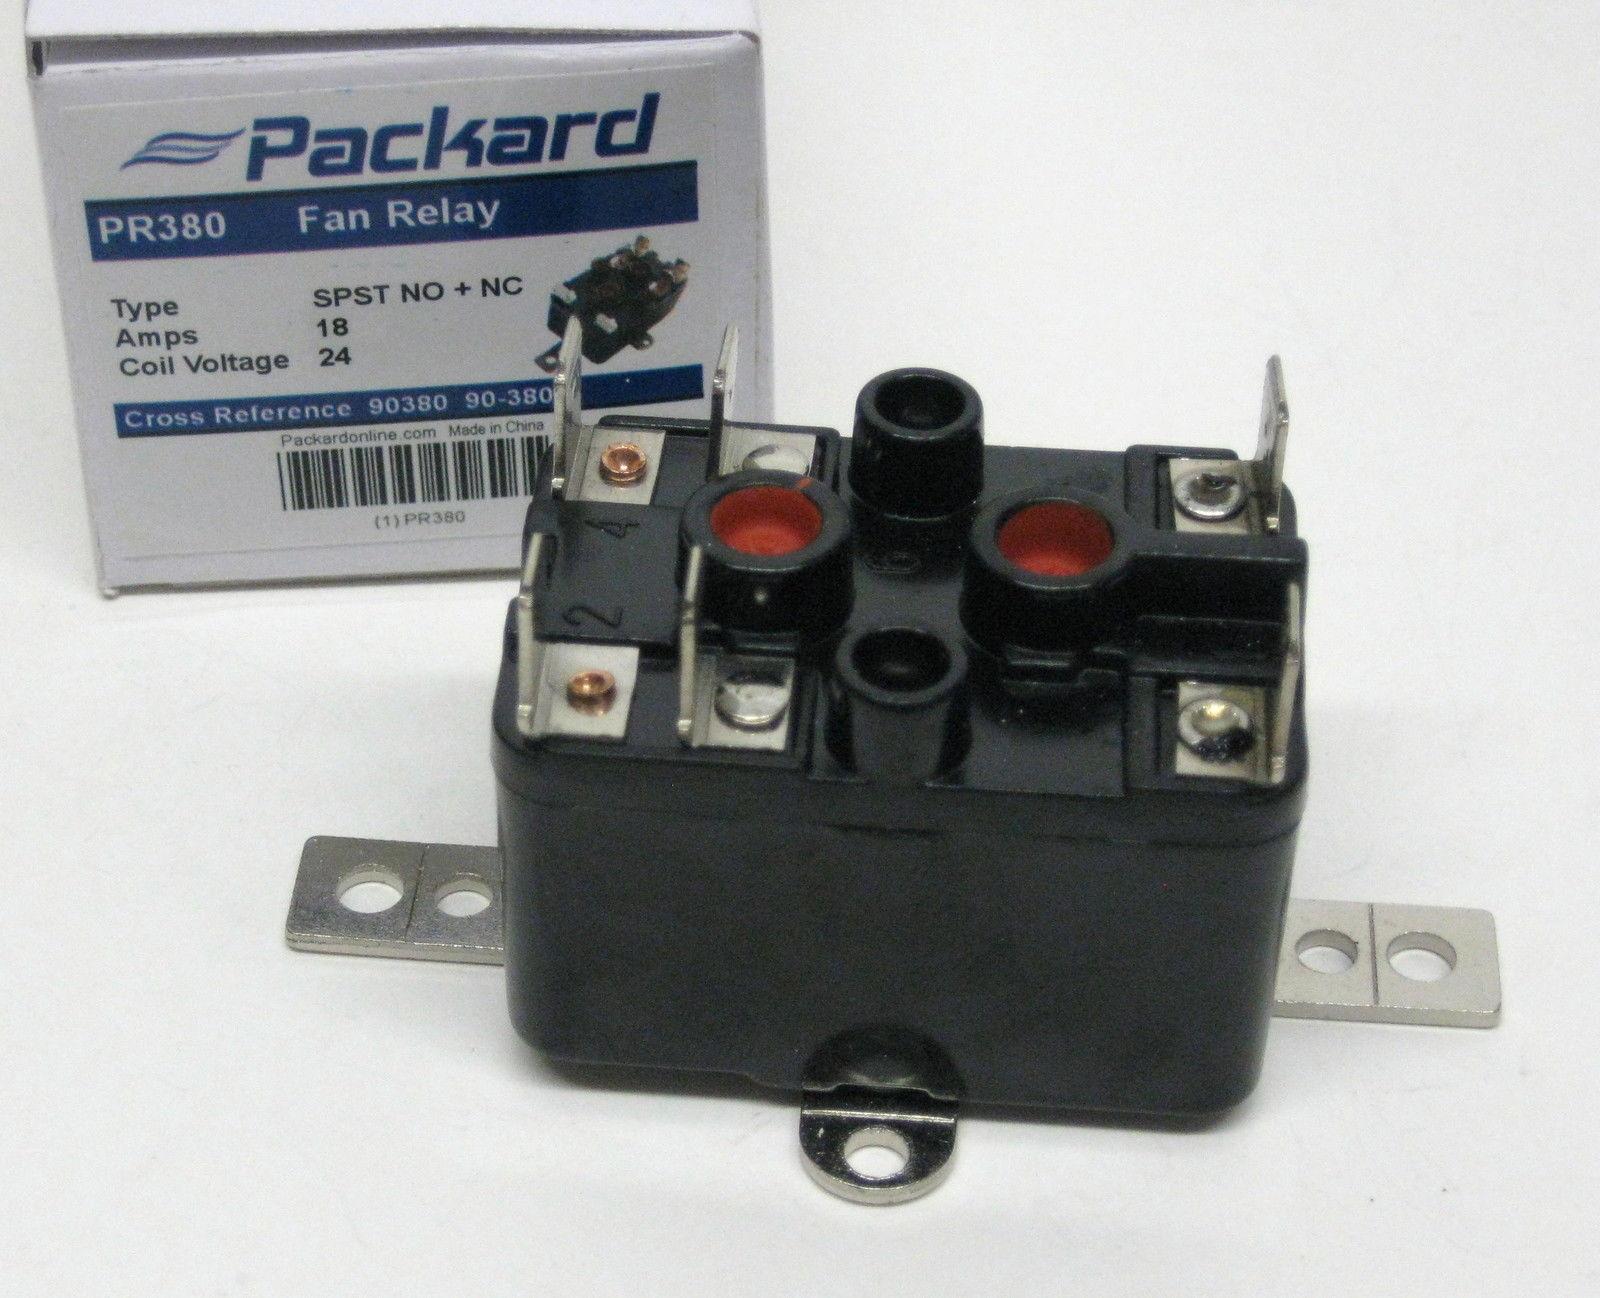 0.56 Hole Diameter Bronze 1//2 0.92 Length Size Midland 44-673 Bronze Fitting Solid Square Head Plug